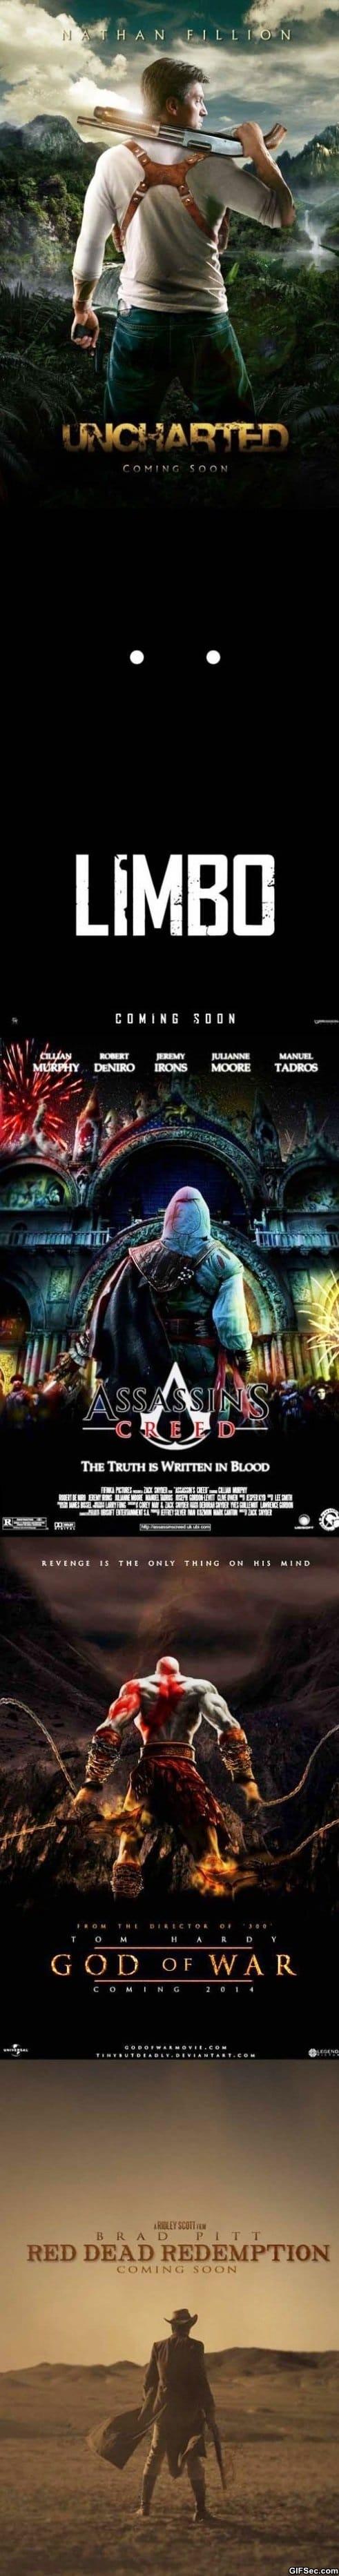 movie-adaptations-of-popular-video-games